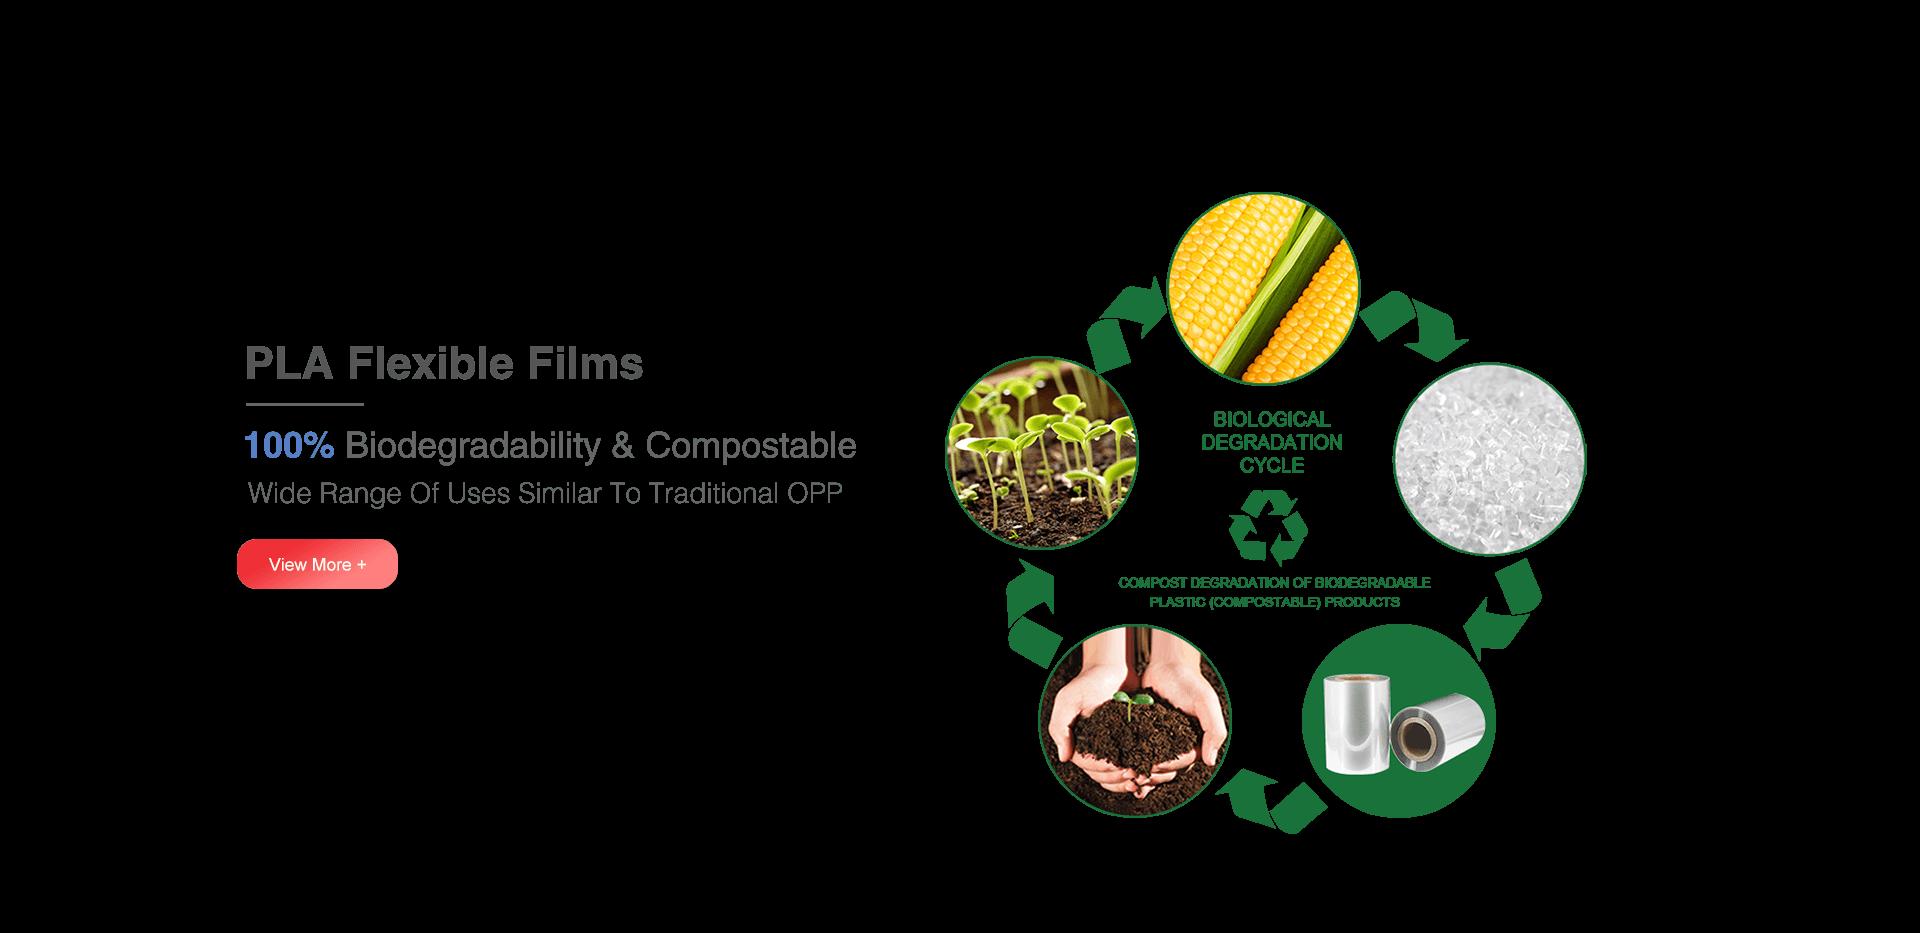 PLA Flexible Films